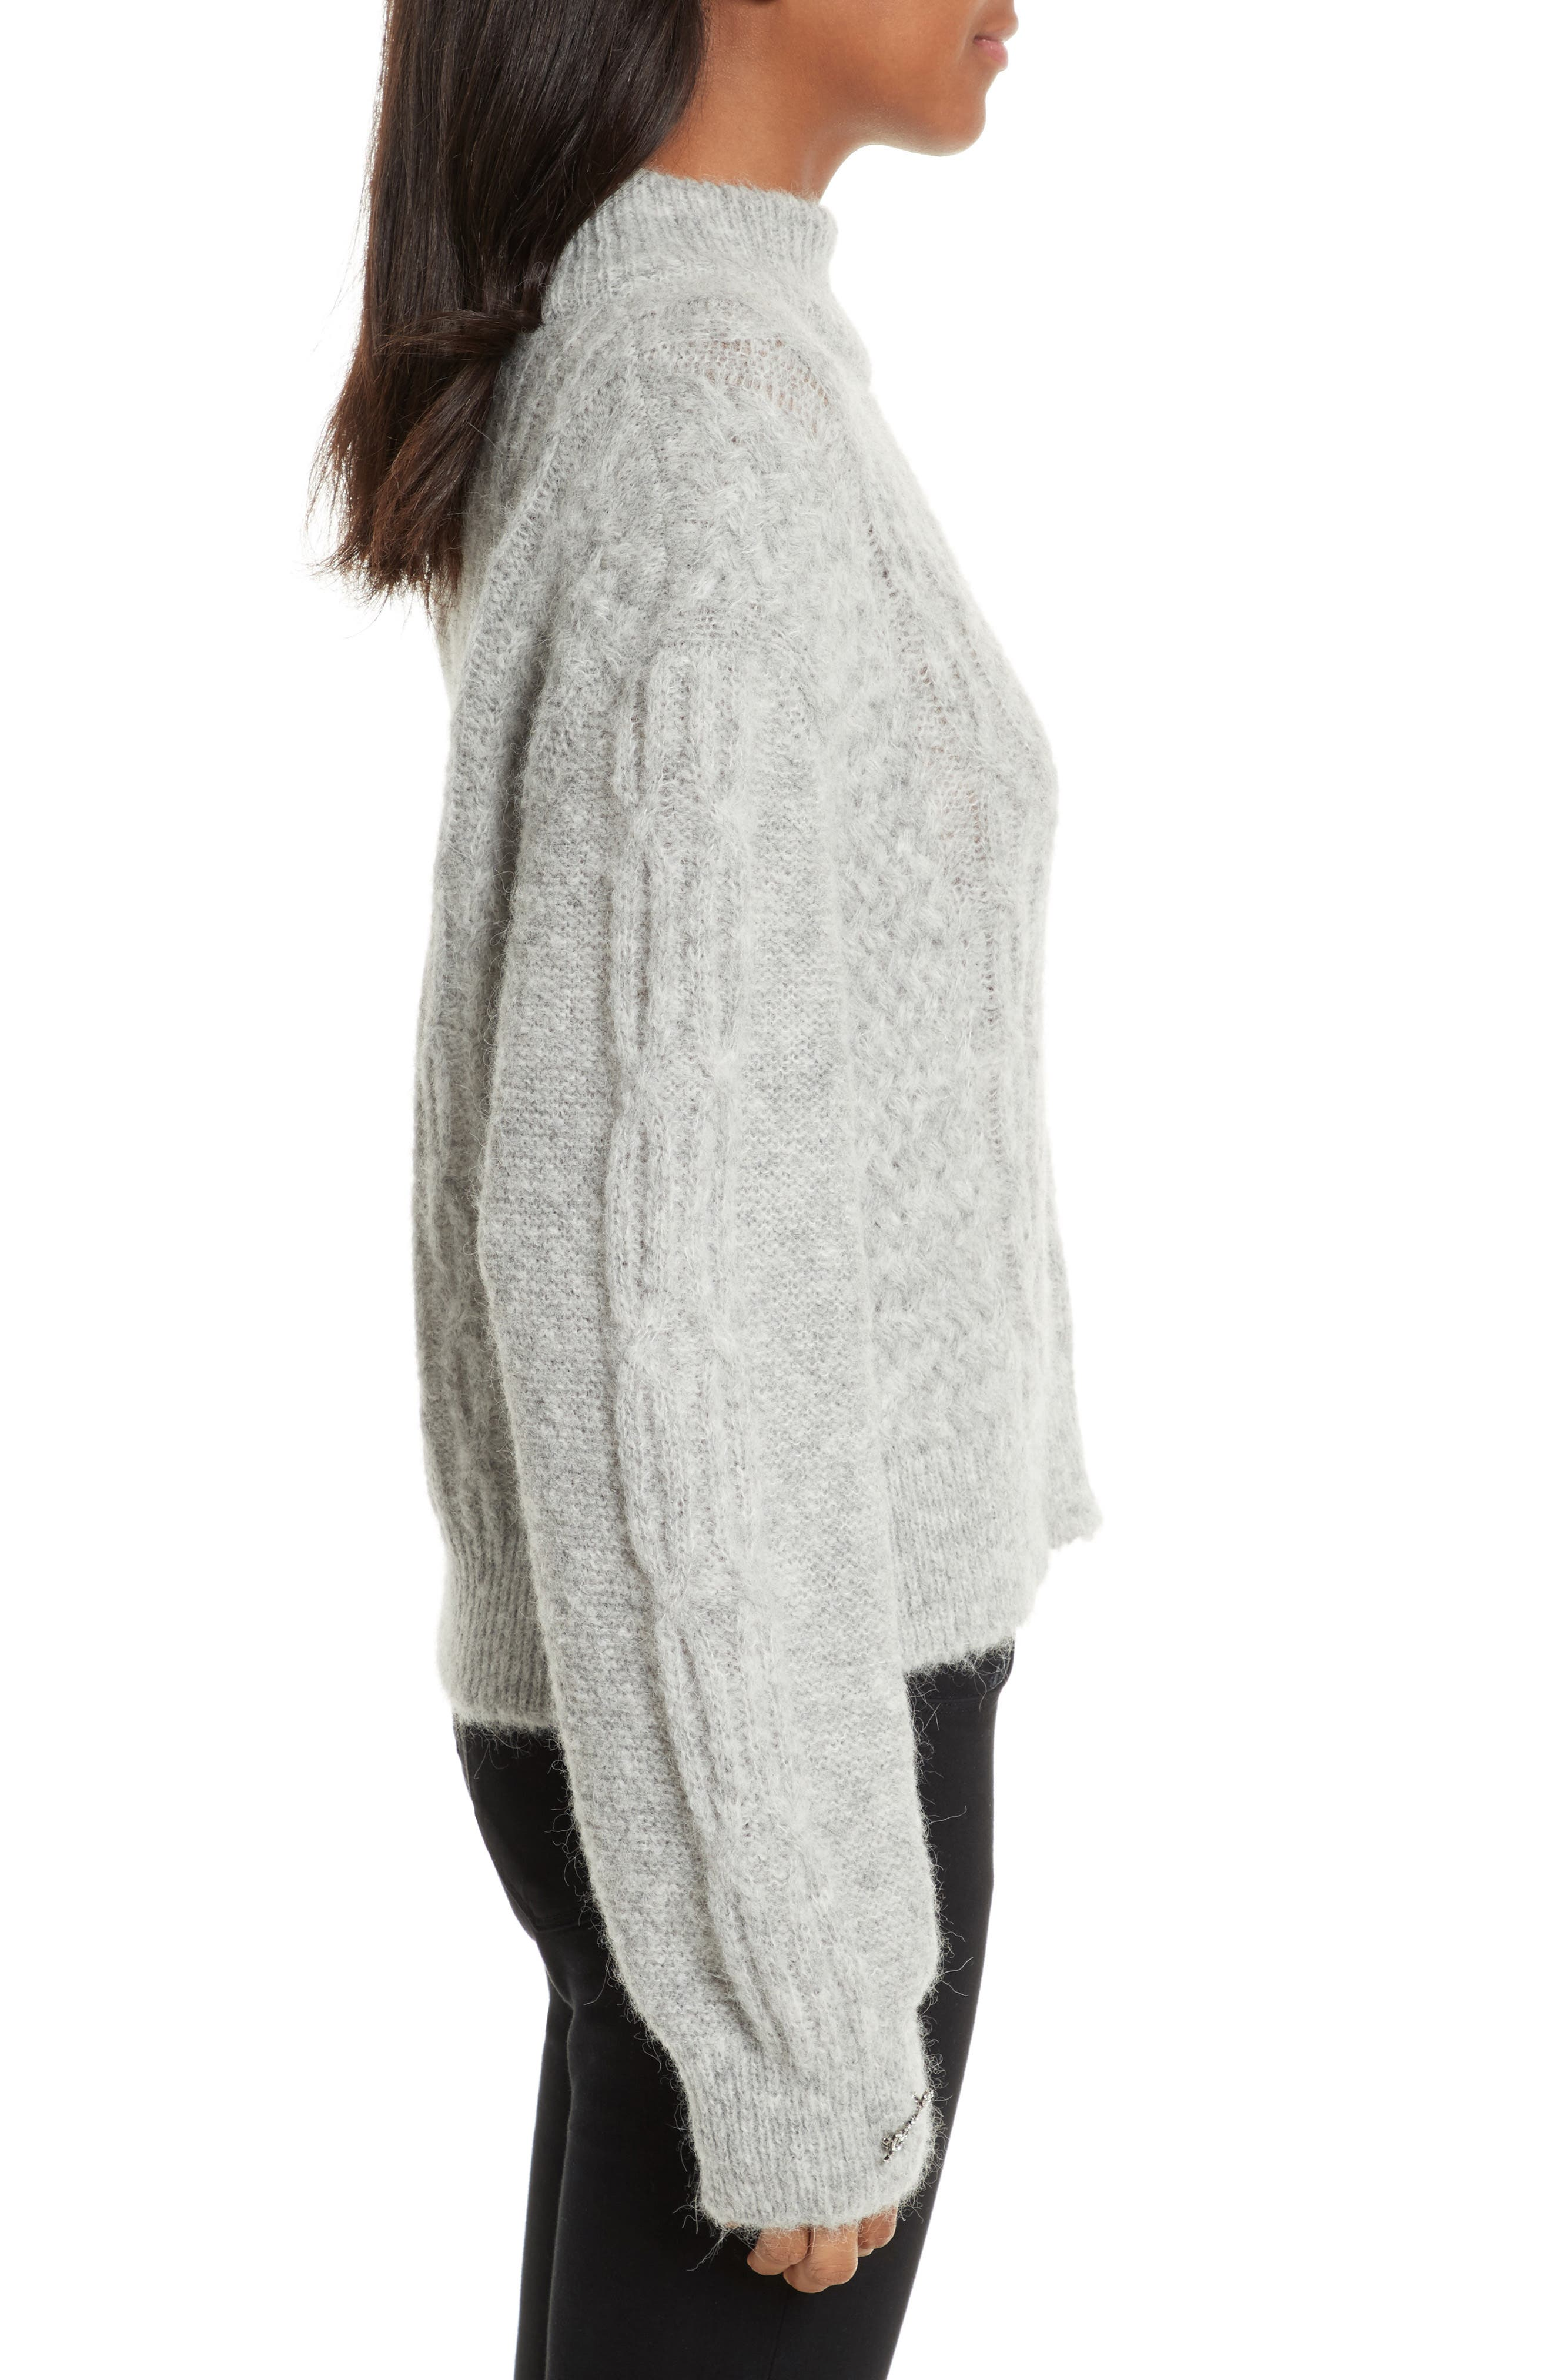 Garlan Mock Neck Sweater,                             Alternate thumbnail 3, color,                             Light Heather Grey